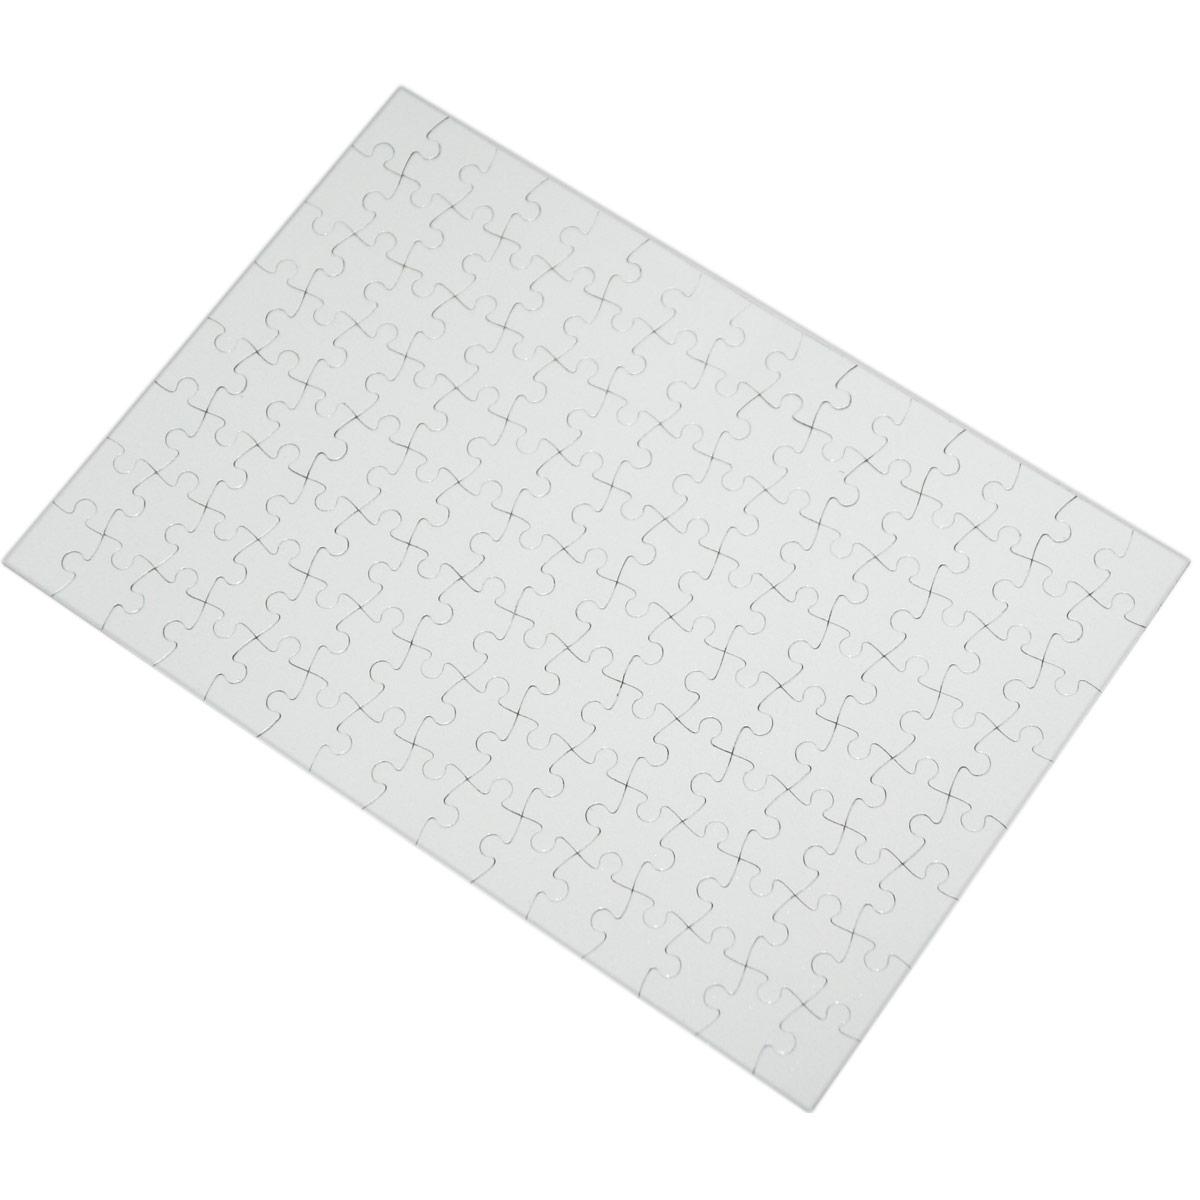 Magnetic puzzles for sublimation 126 elements